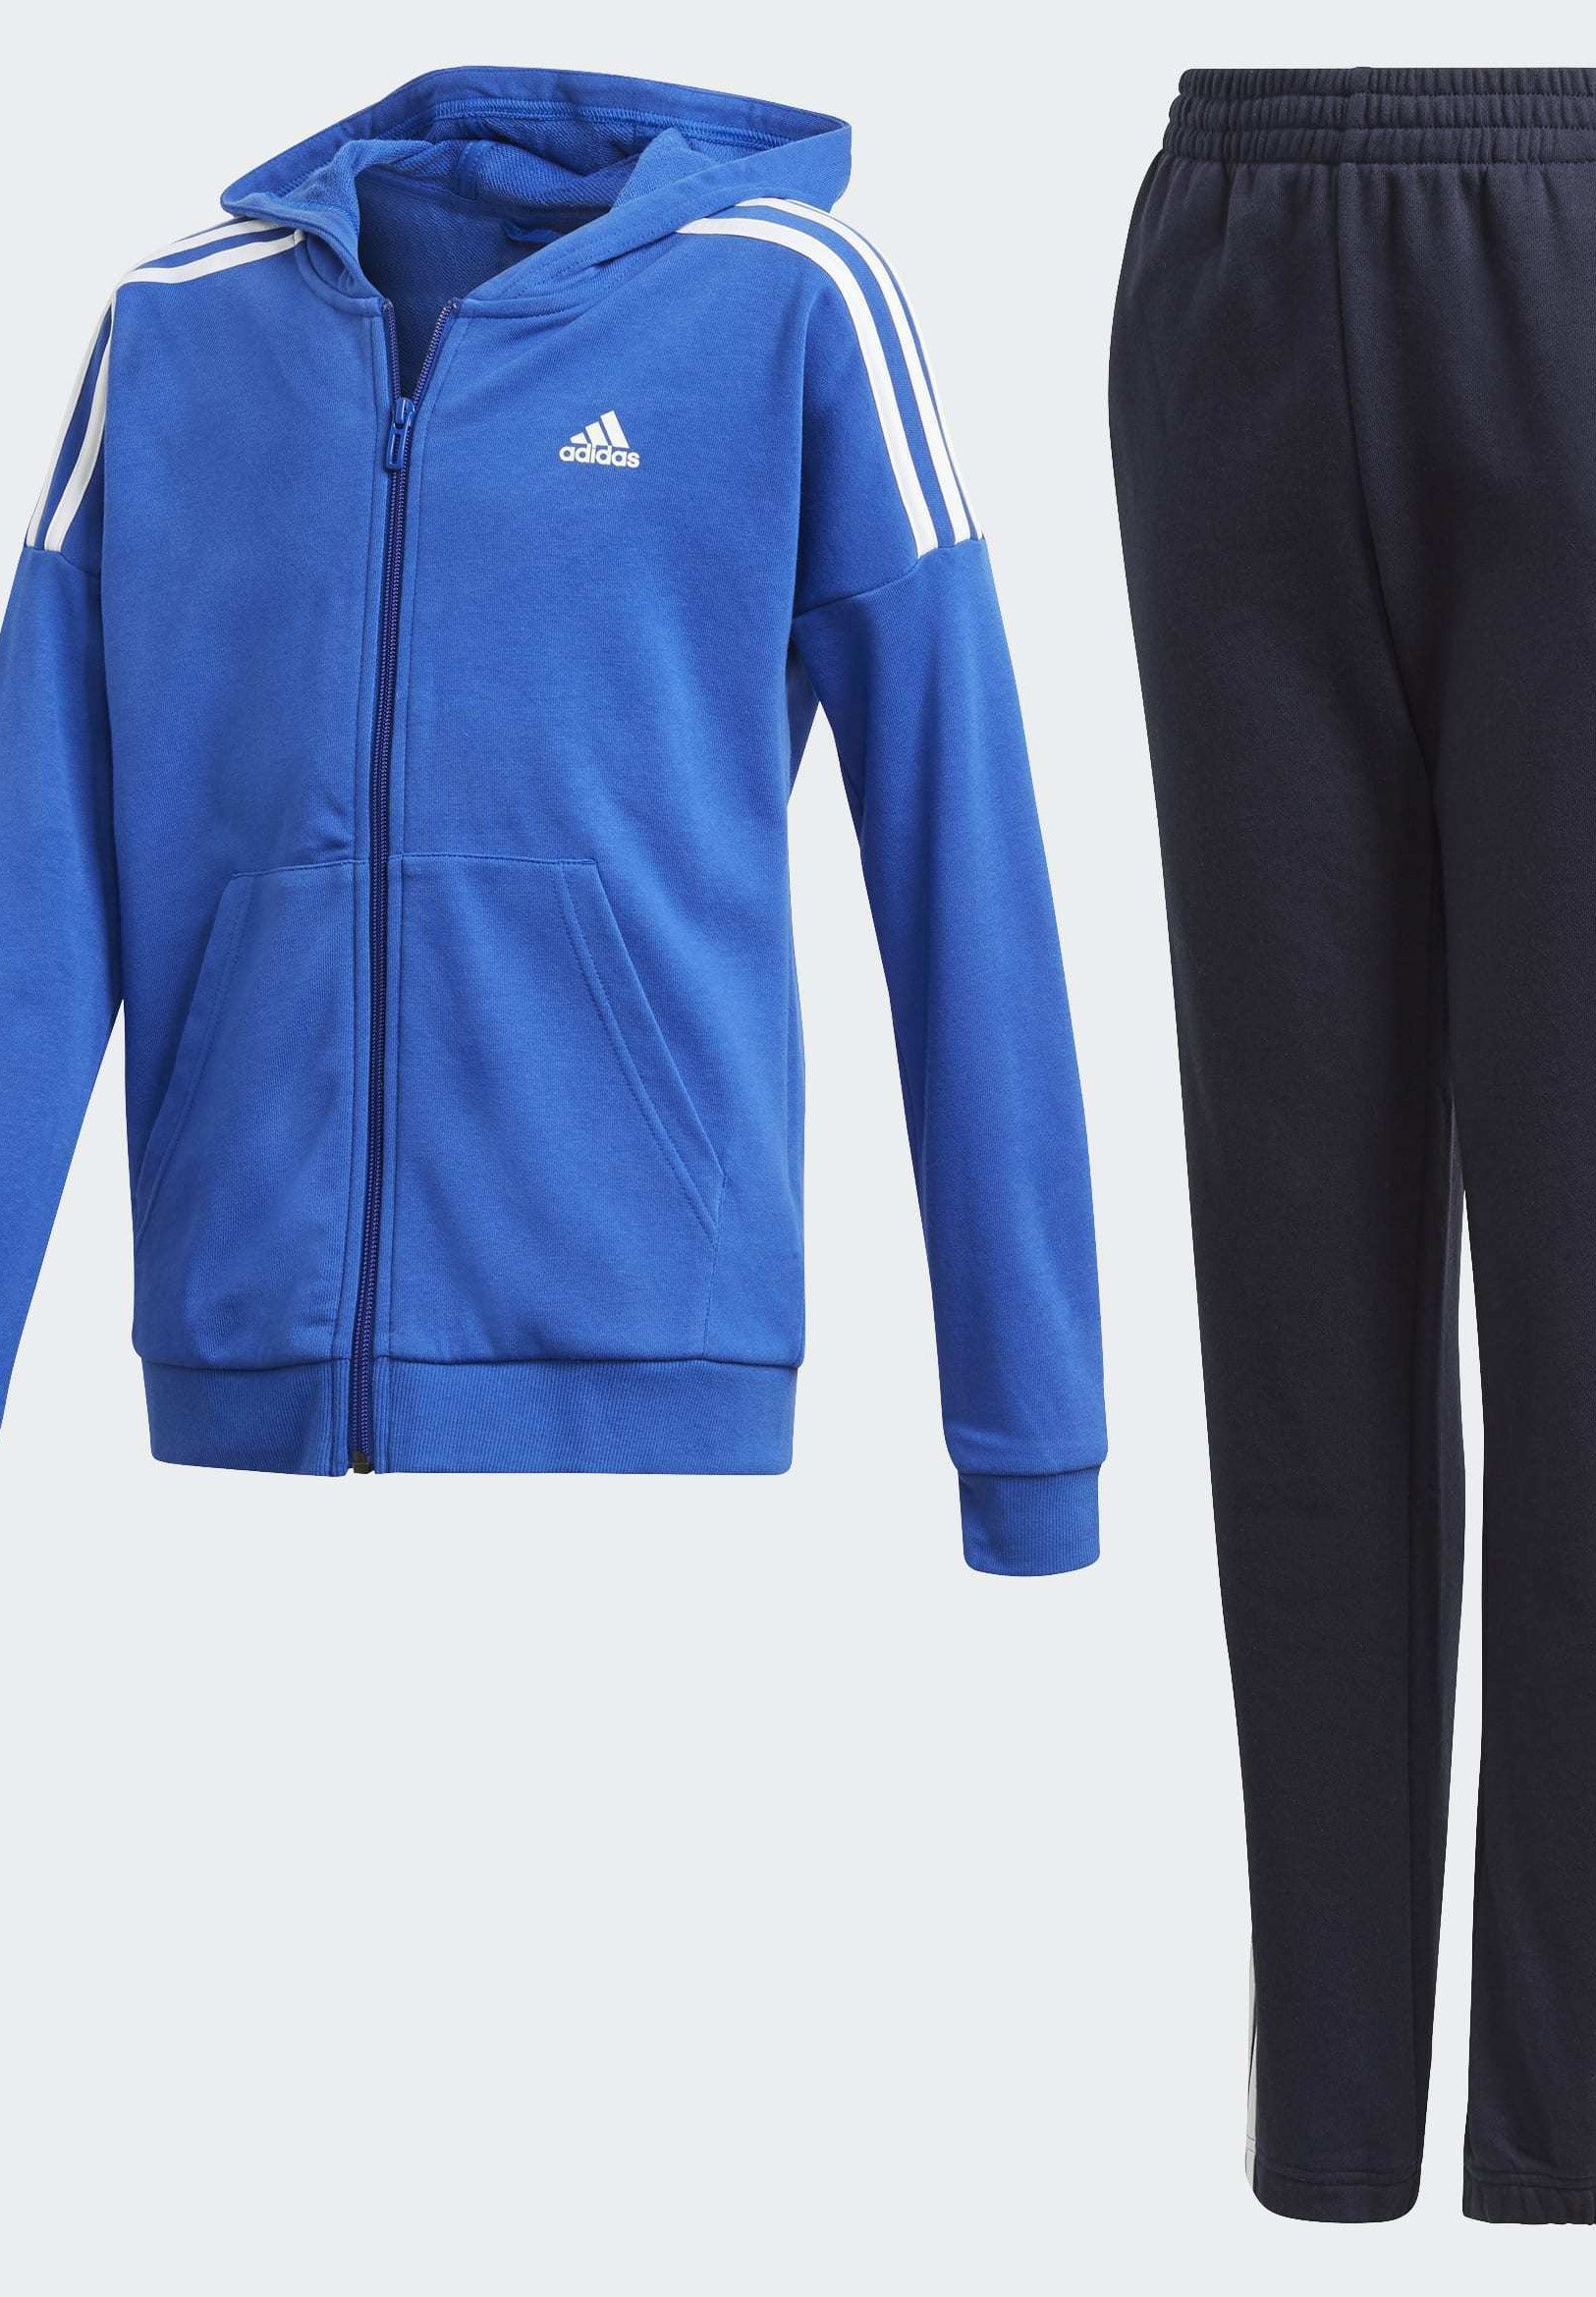 adidas Tiro Tracksuit, Trainingsanzug, Junior Blau